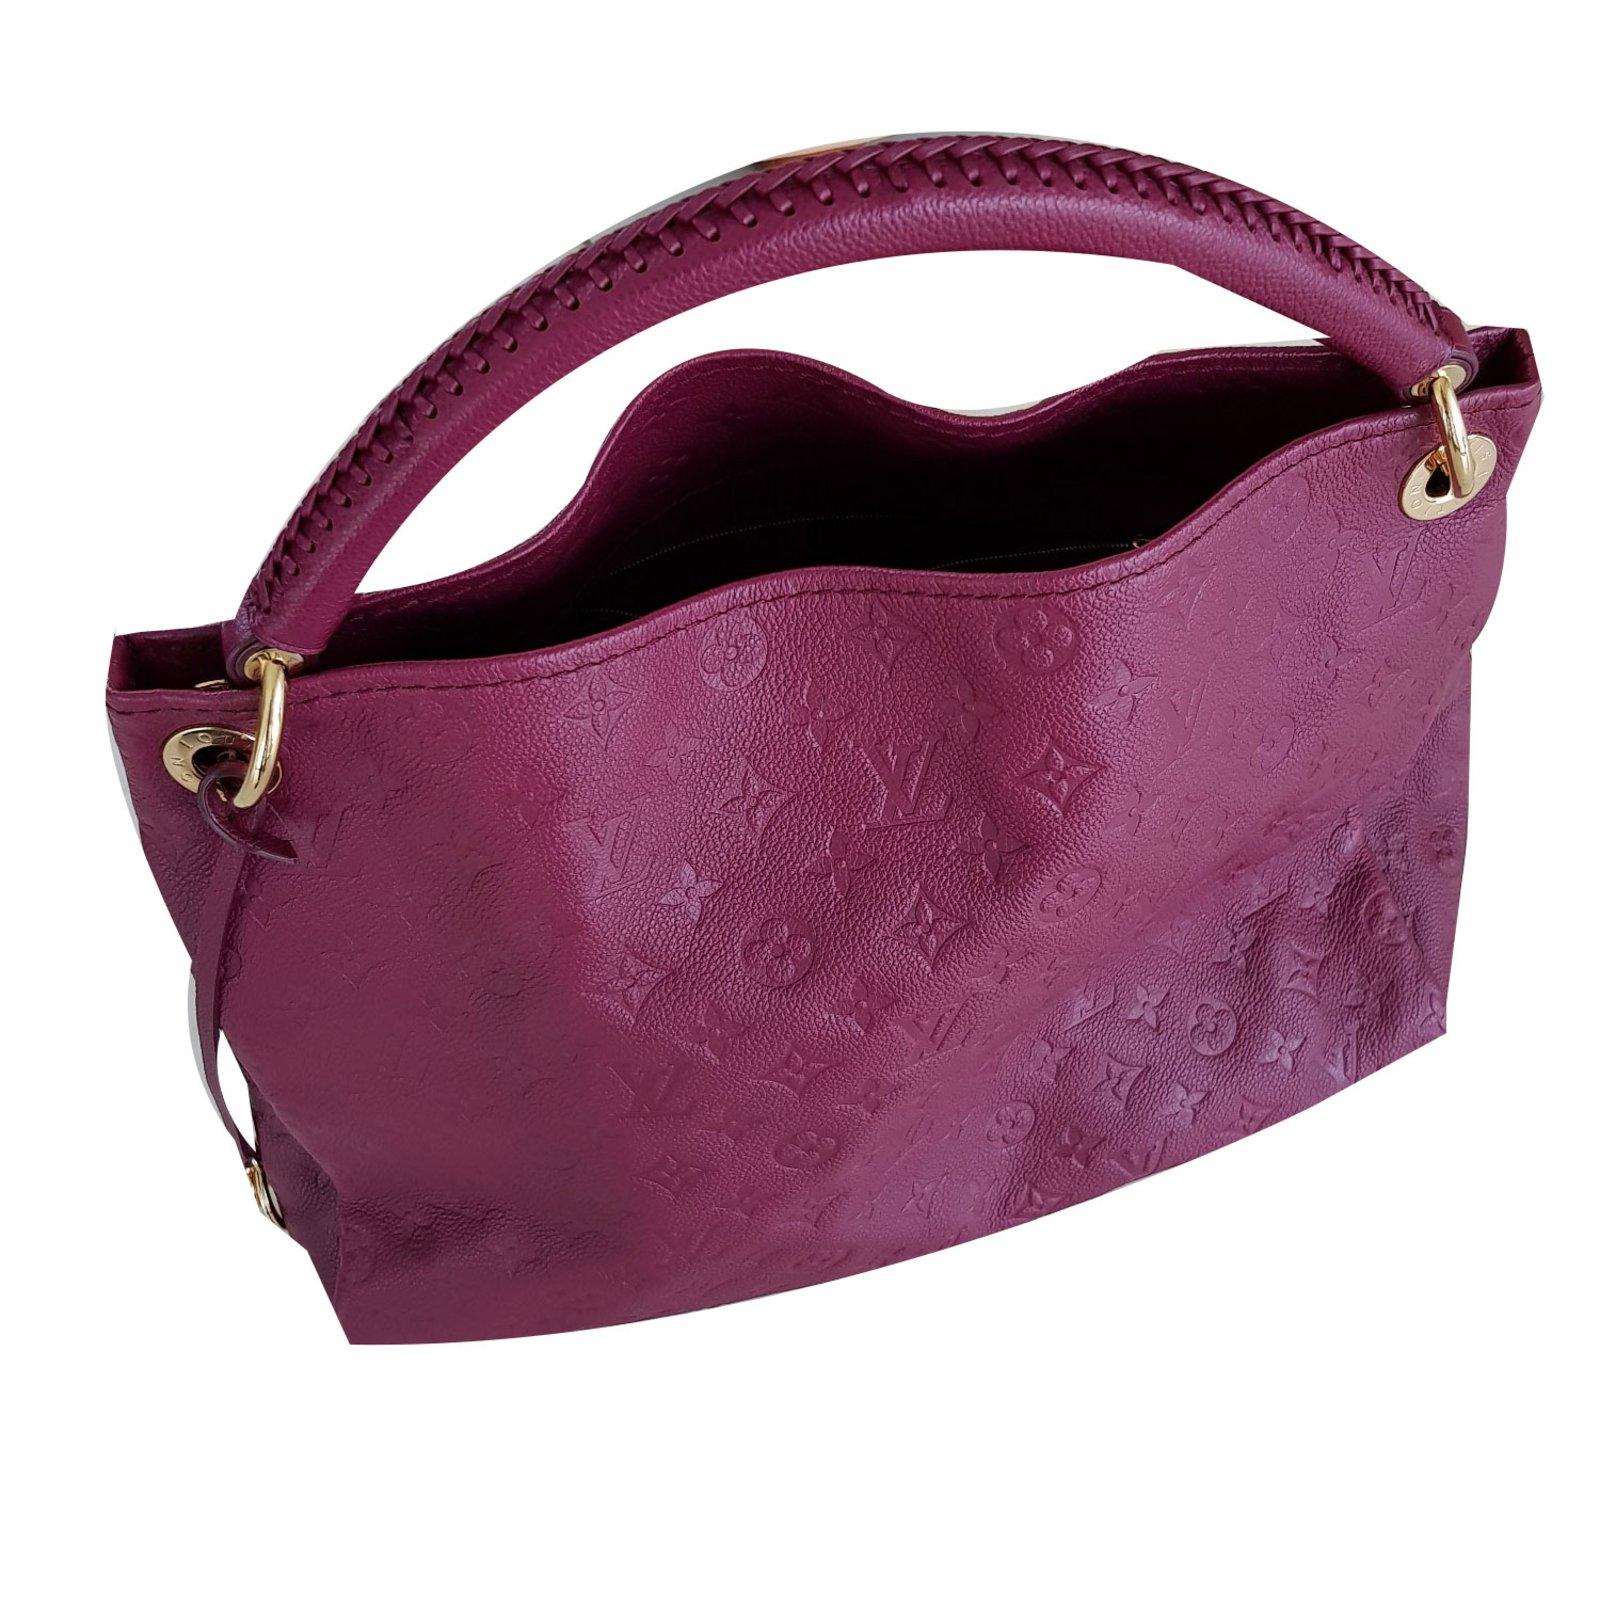 f5cd89037530 Louis Vuitton Artsy MM Handbags Leather Dark red ref.58890 - Joli Closet